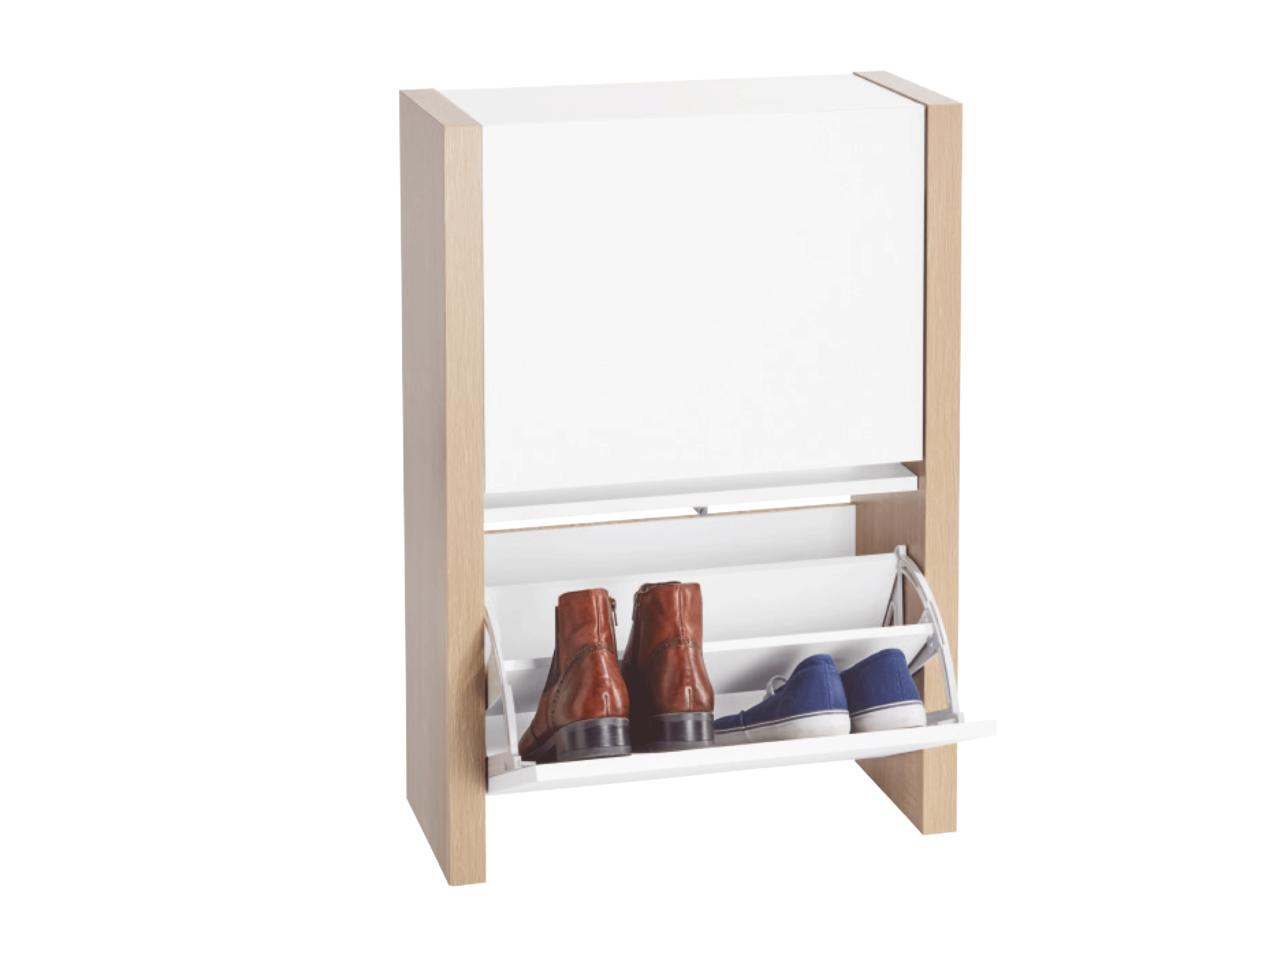 Livarno Display Cabinet Wallpaperall